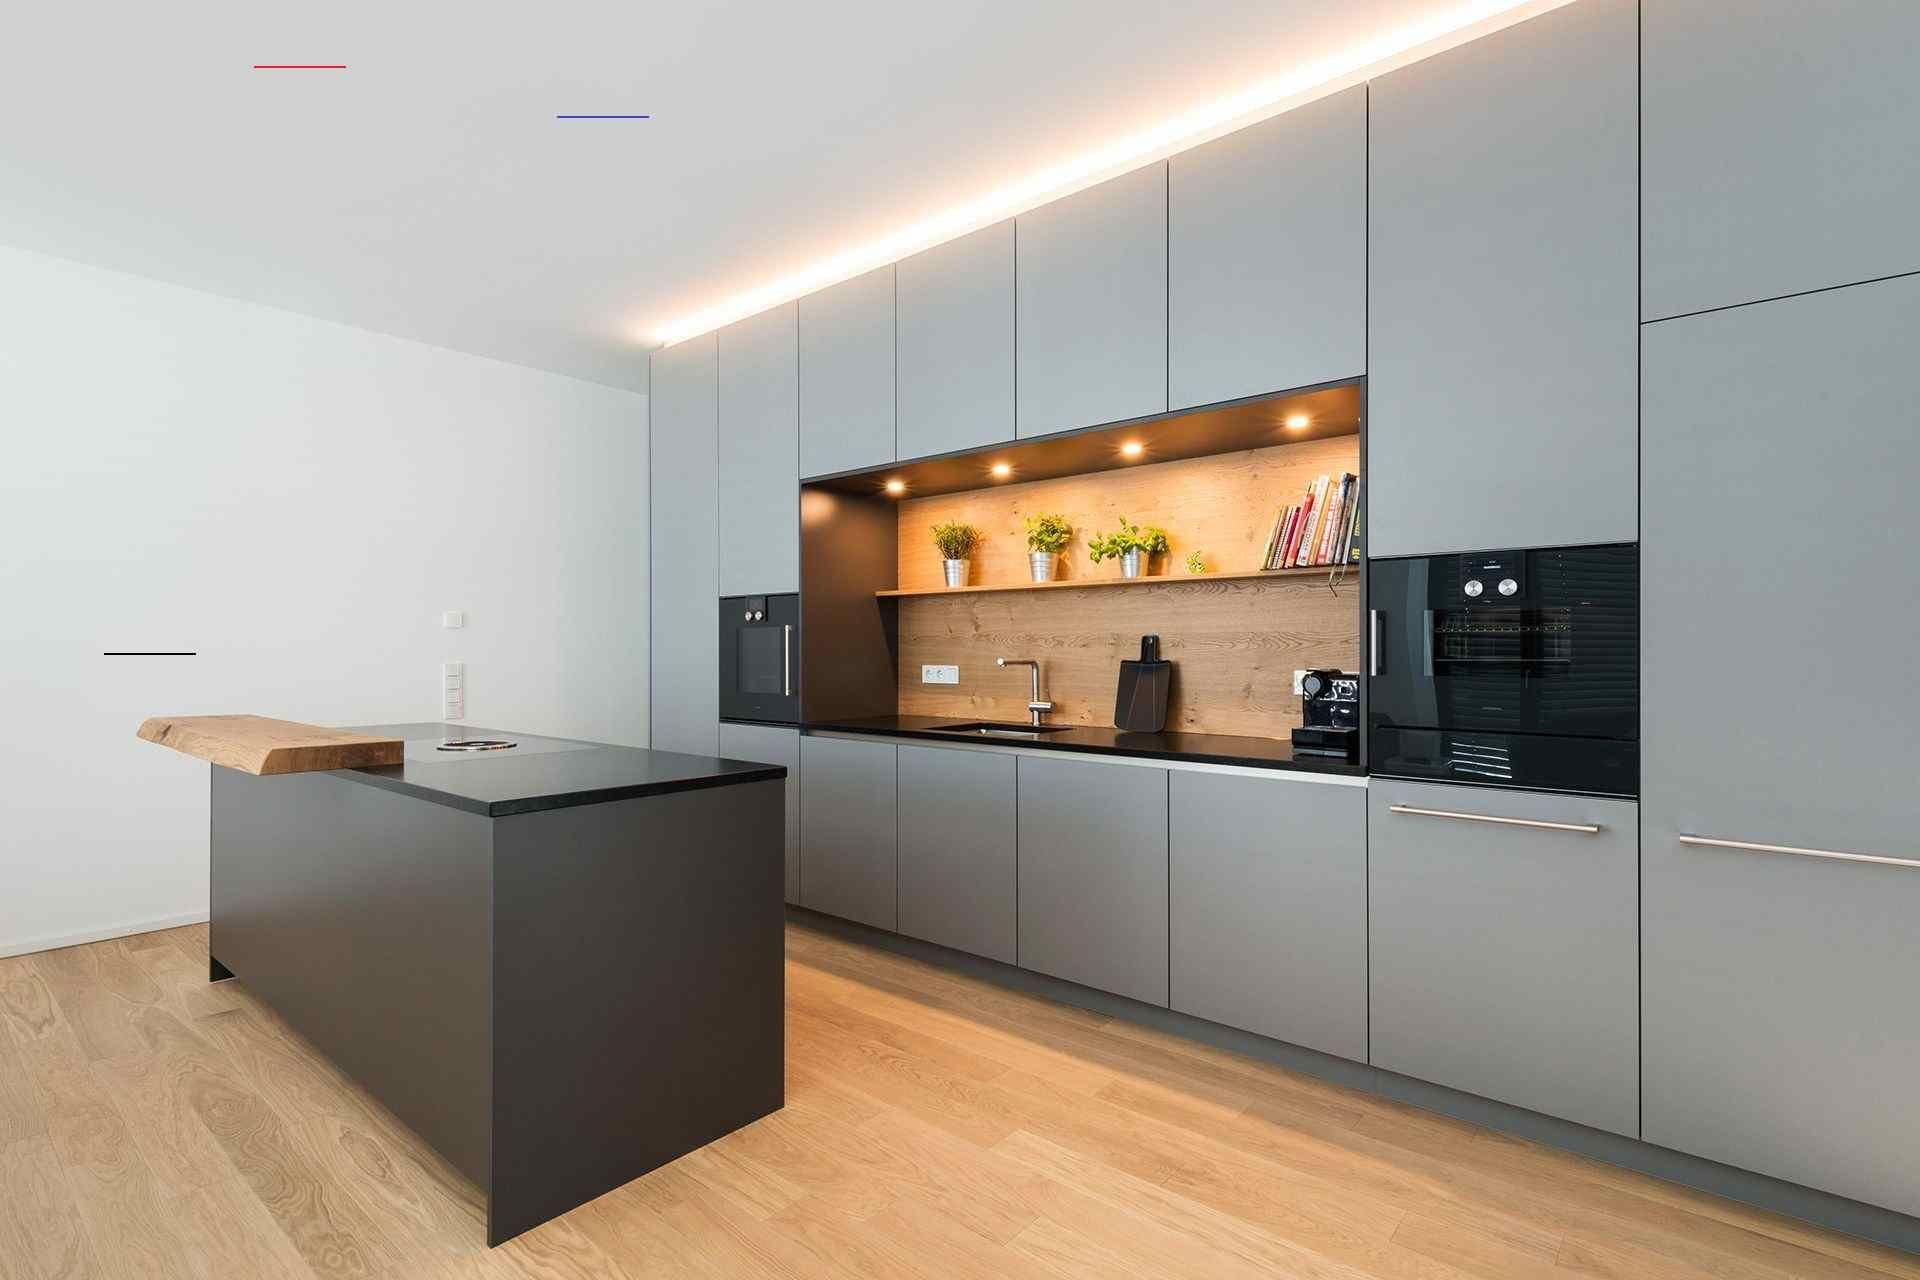 Pin Di Ervin Aziz Su Keuken Nel 2020 Cucina Loft Stile Cucina Idee Per La Cucina